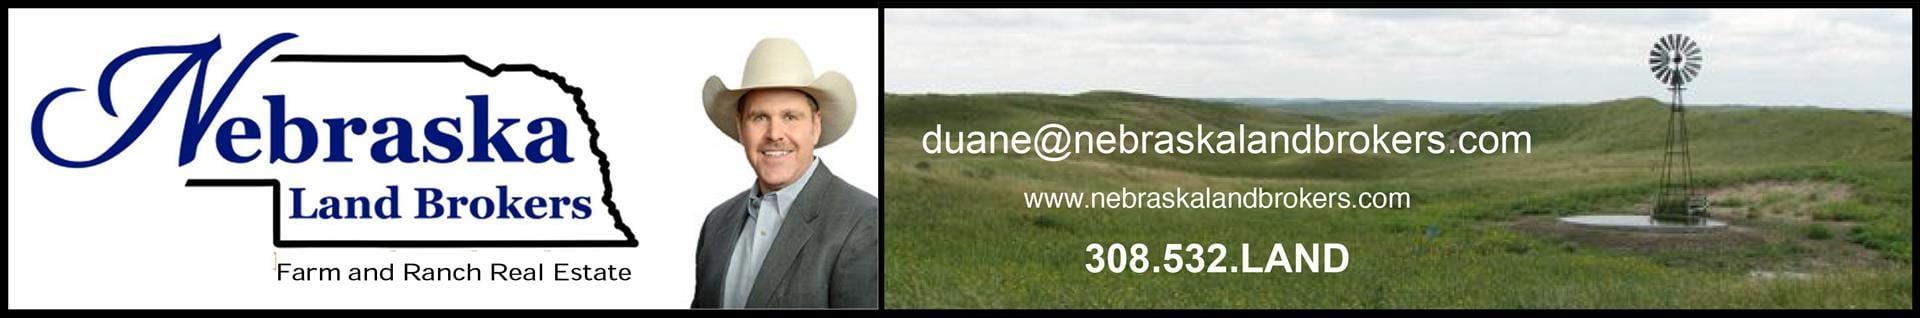 Duane-Web-Ad